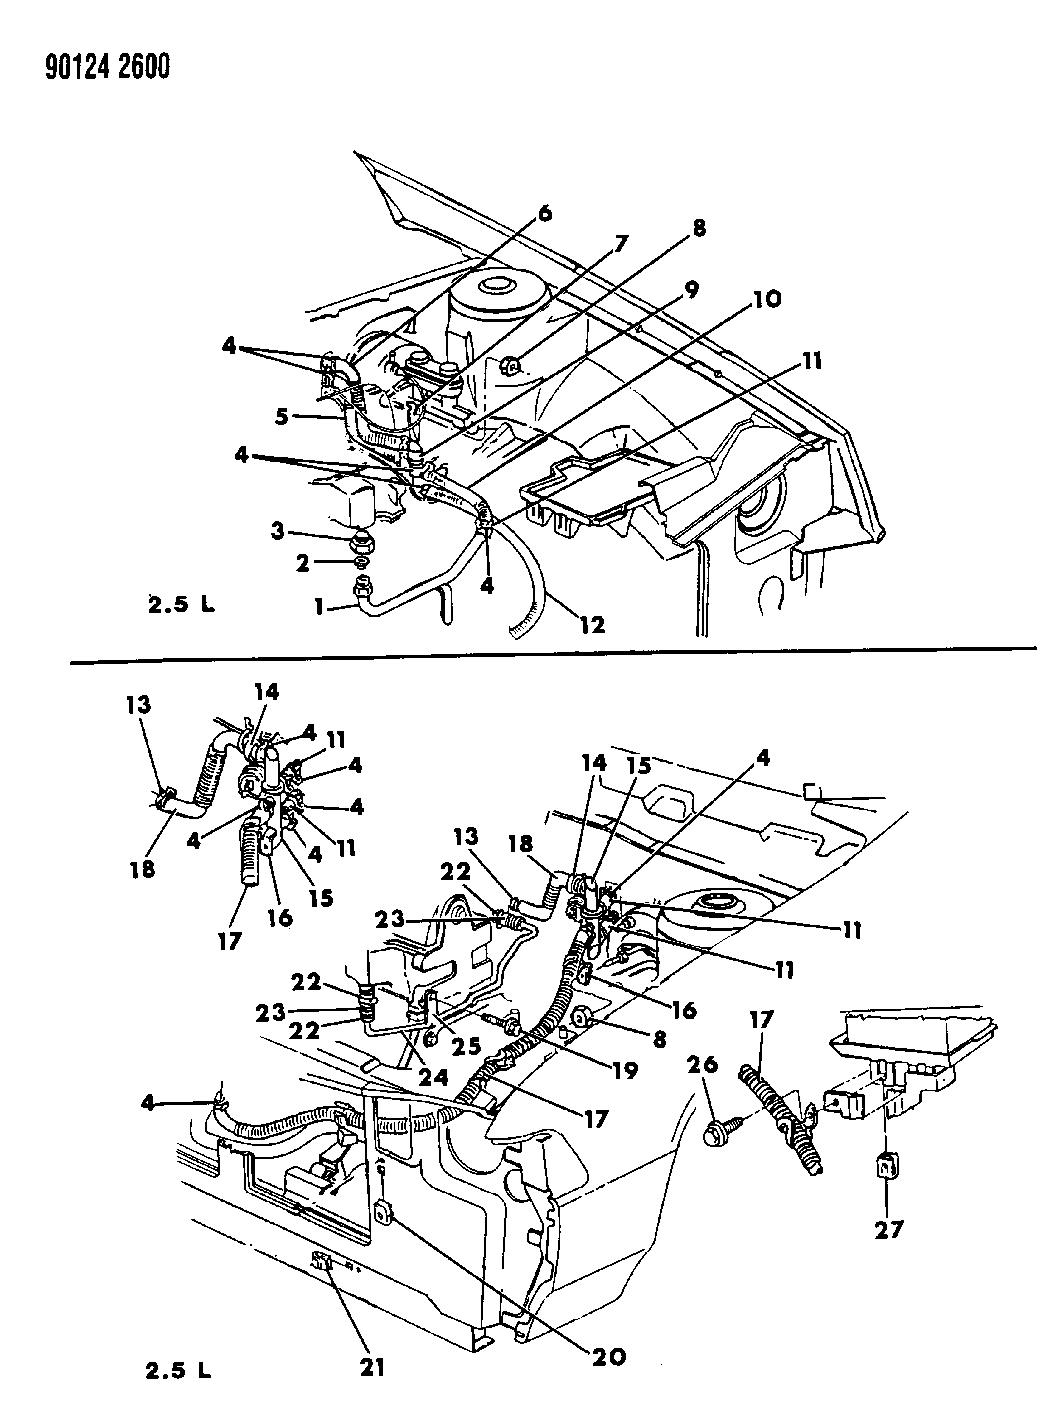 1990 Dodge Spirit Plumbing - A/C & Heater - Thumbnail 1